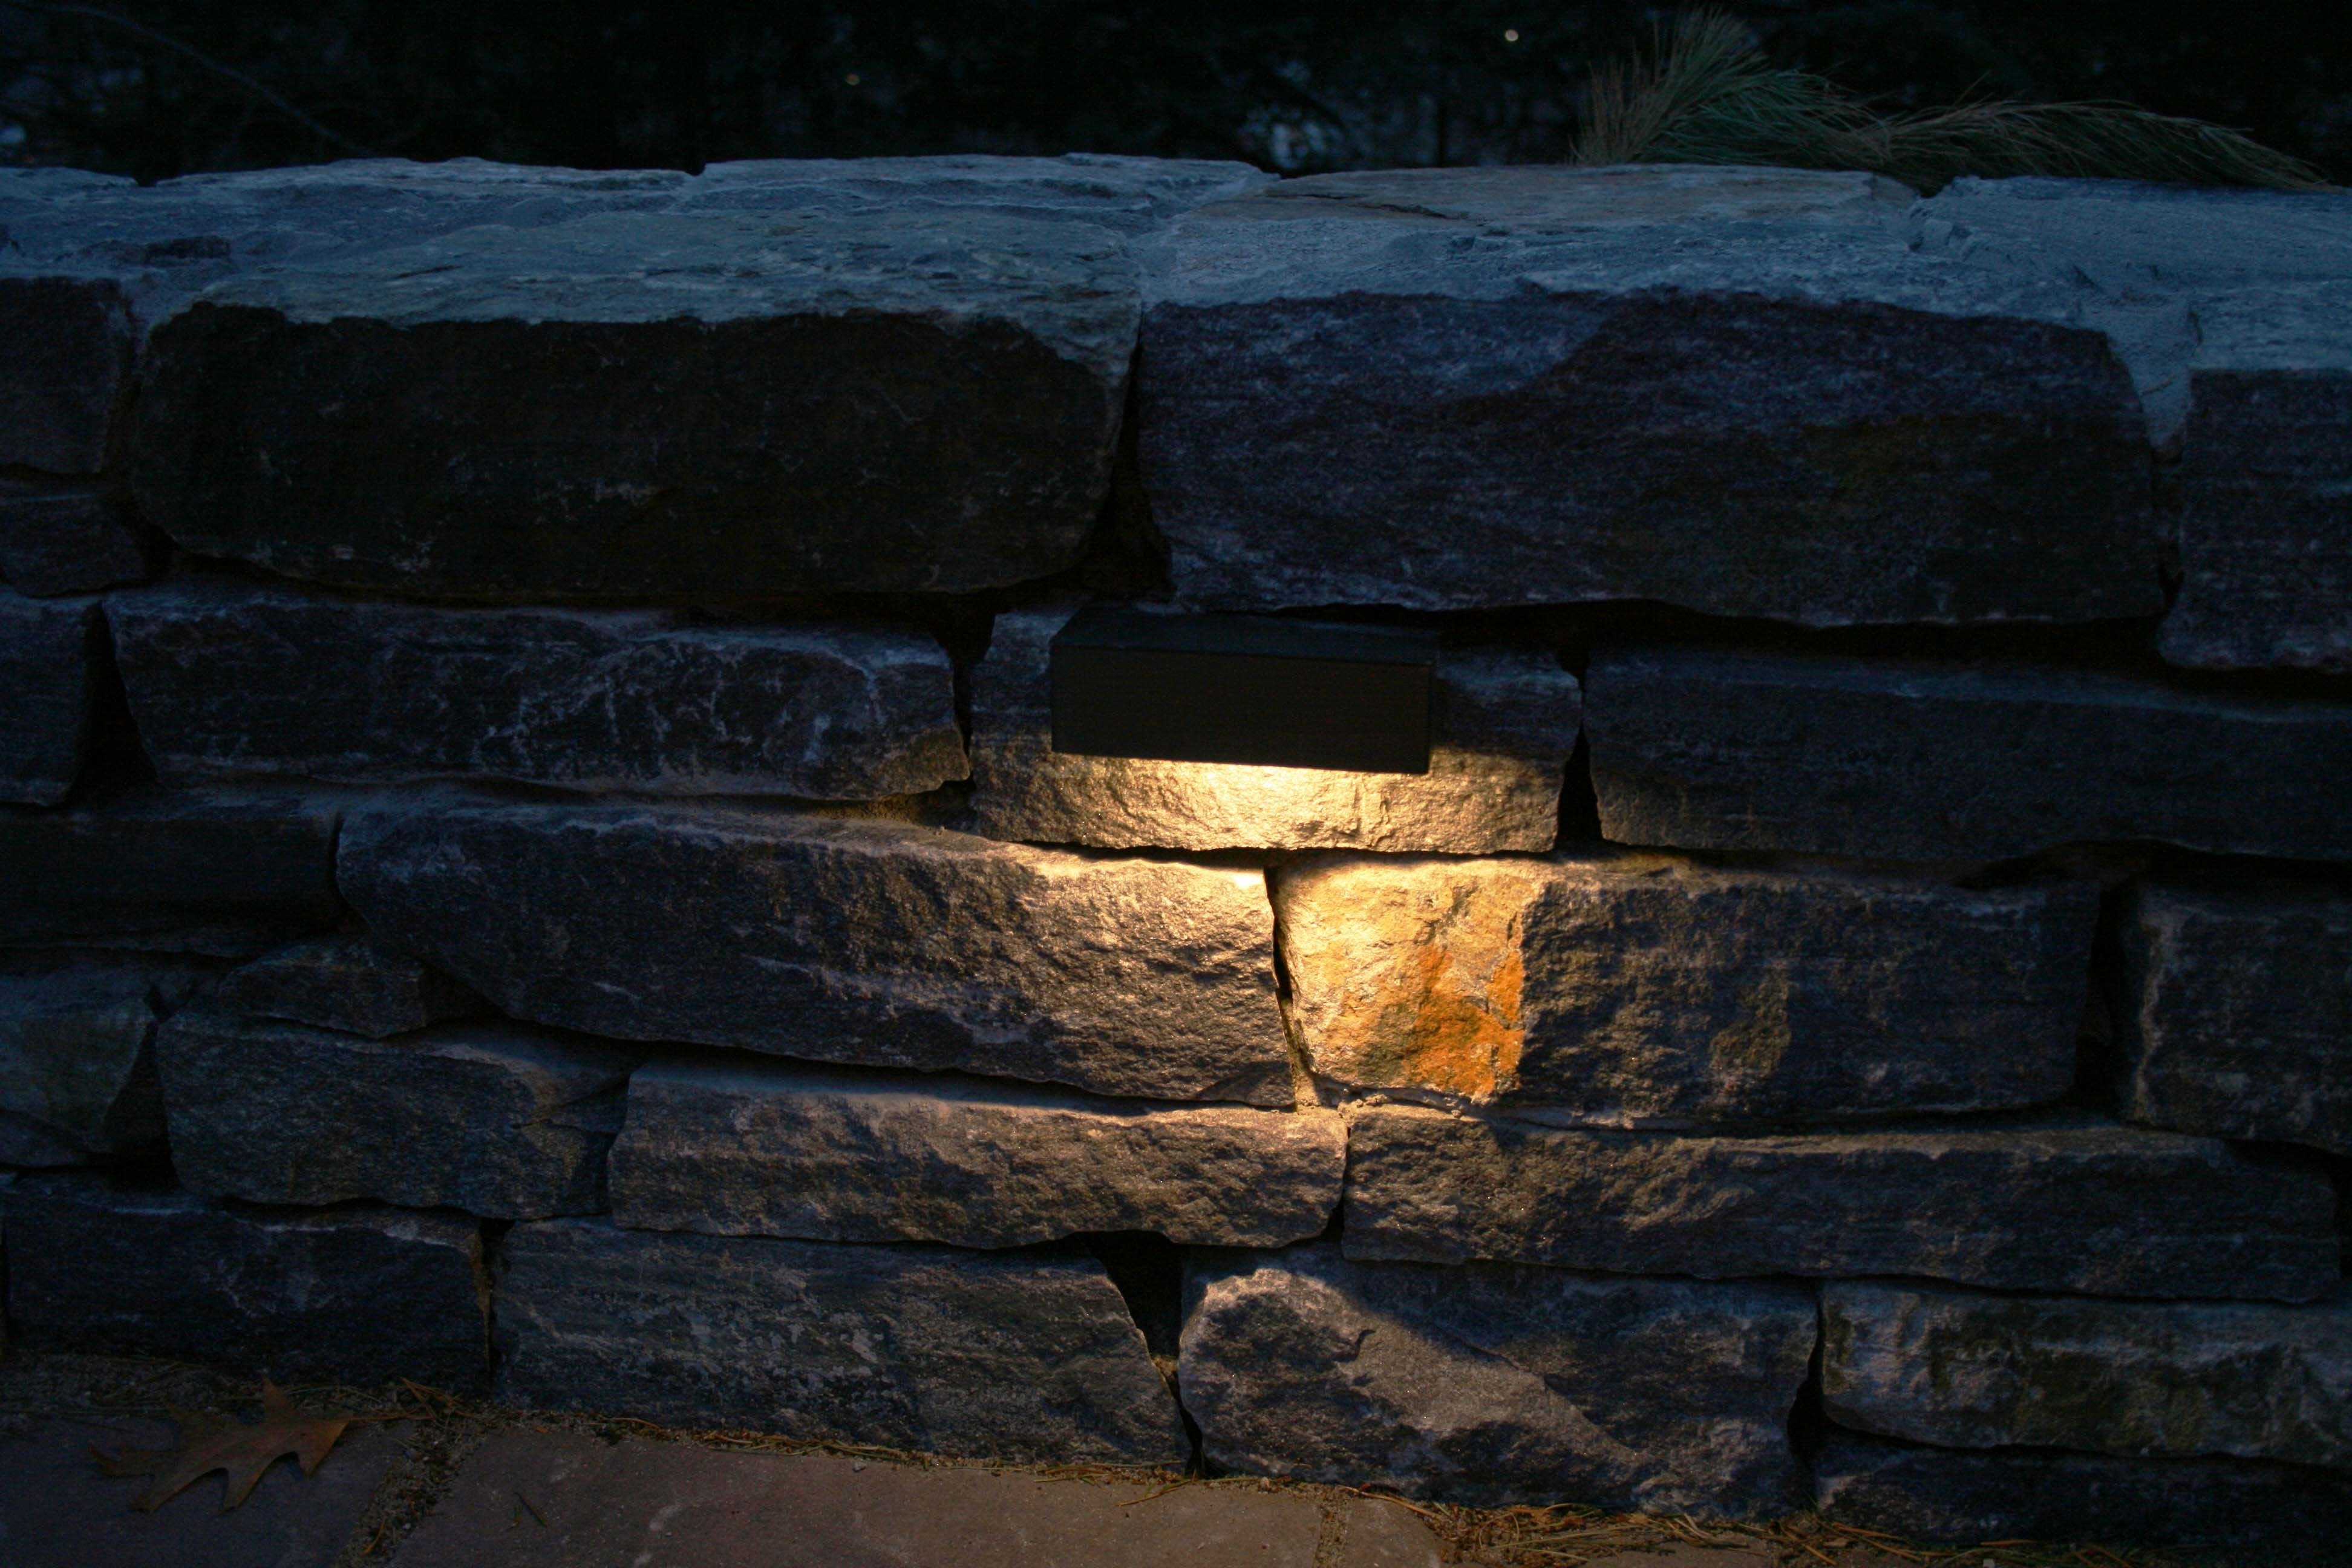 Warisan Lighting Regarding Outdoor Stone Wall Lighting (View 19 of 20)